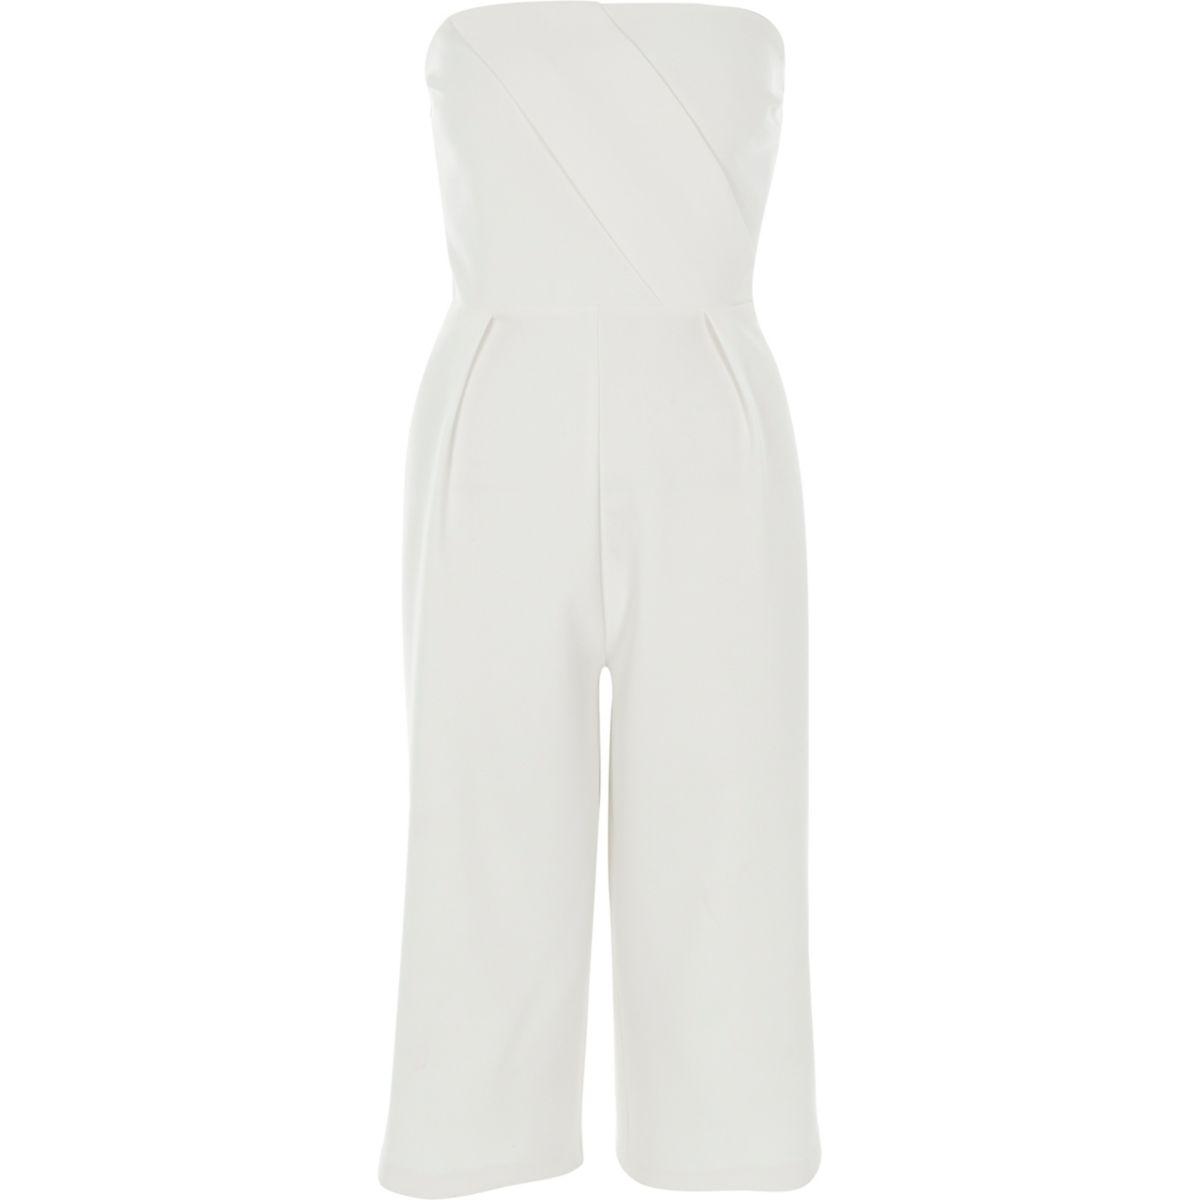 Cream bardot wide leg culotte jumpsuit